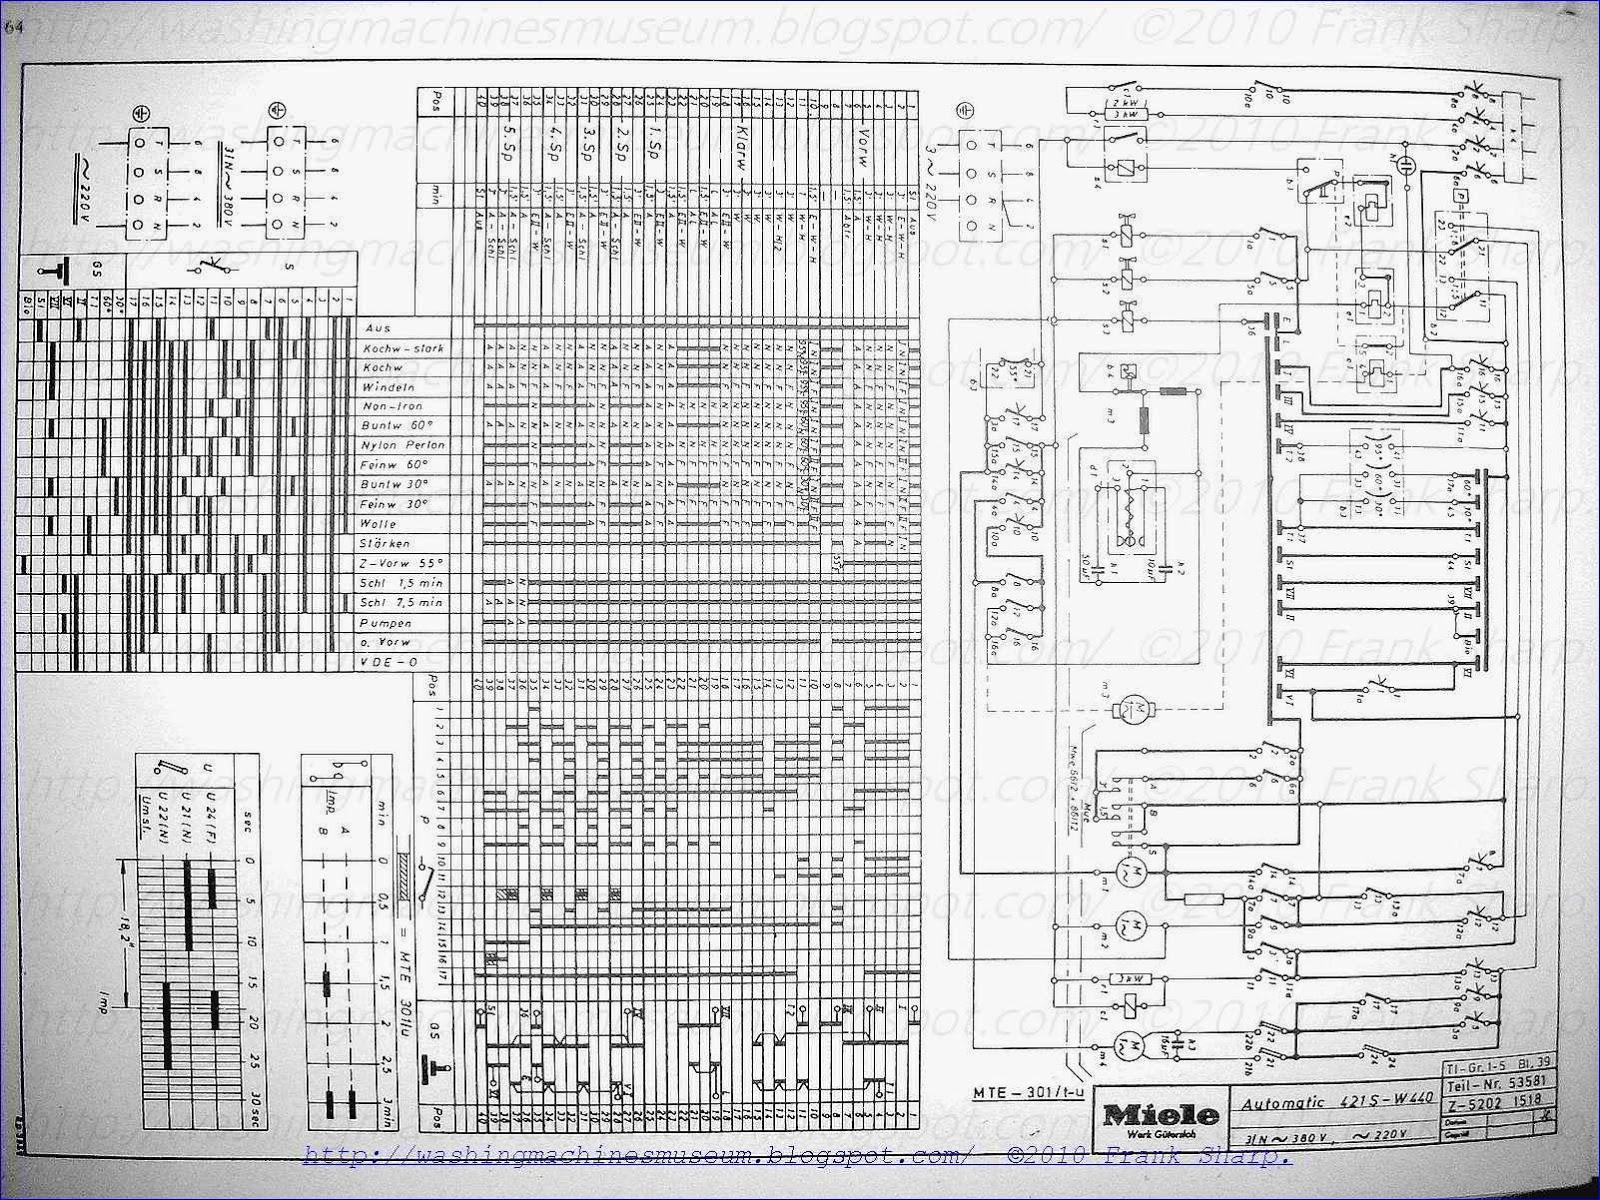 nova wiring diagram image wiring diagram wiring diagram for 1970 nova the wiring diagram on 1970 nova wiring diagram